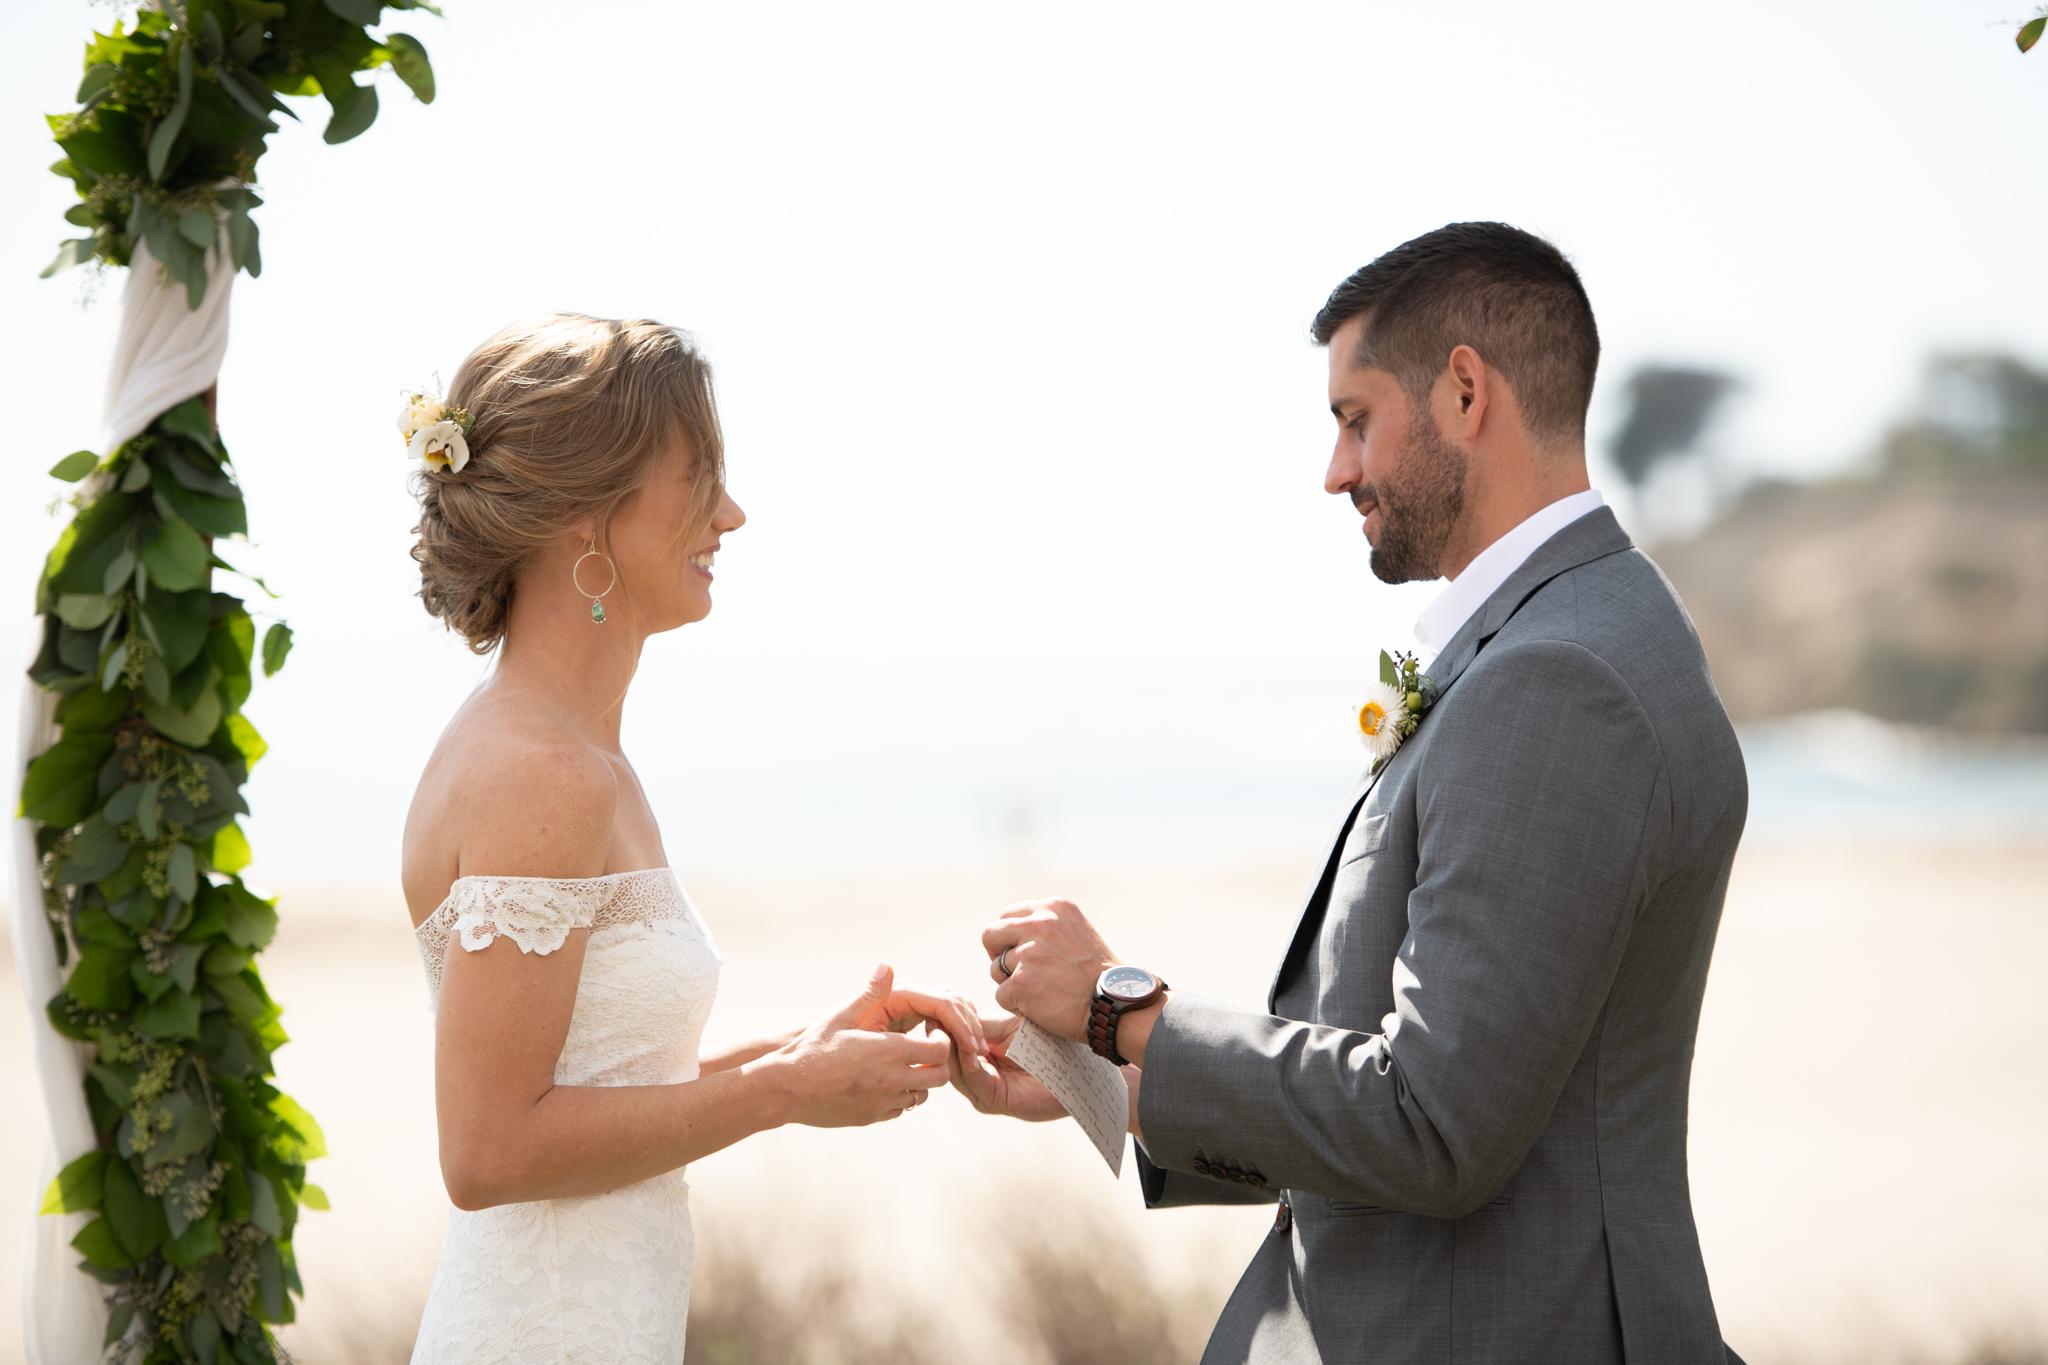 34_PRVW_Jenny_Ken_Wedding_Trevor_Hooper_Photo.jpg